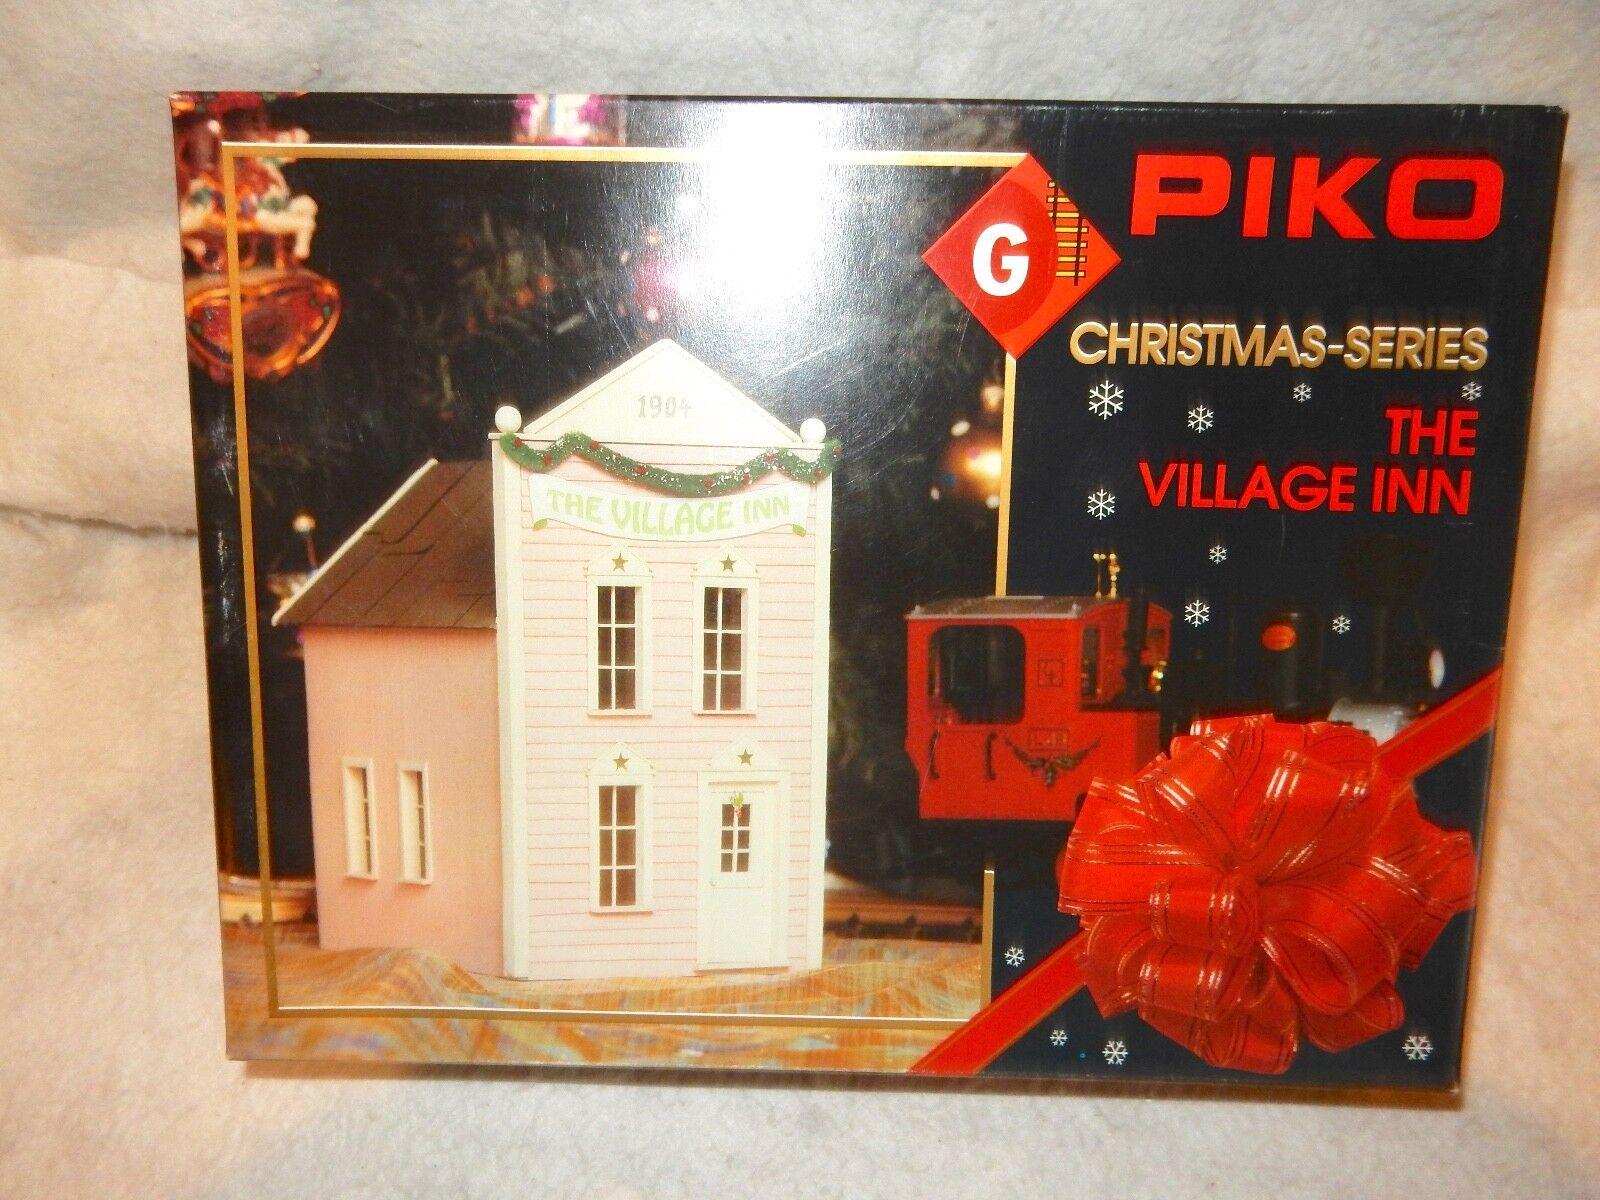 Piko  62202 Village Inn Kit para FerroCocheril Escala G-SERIE X-Mas-nueva Con Caja  --